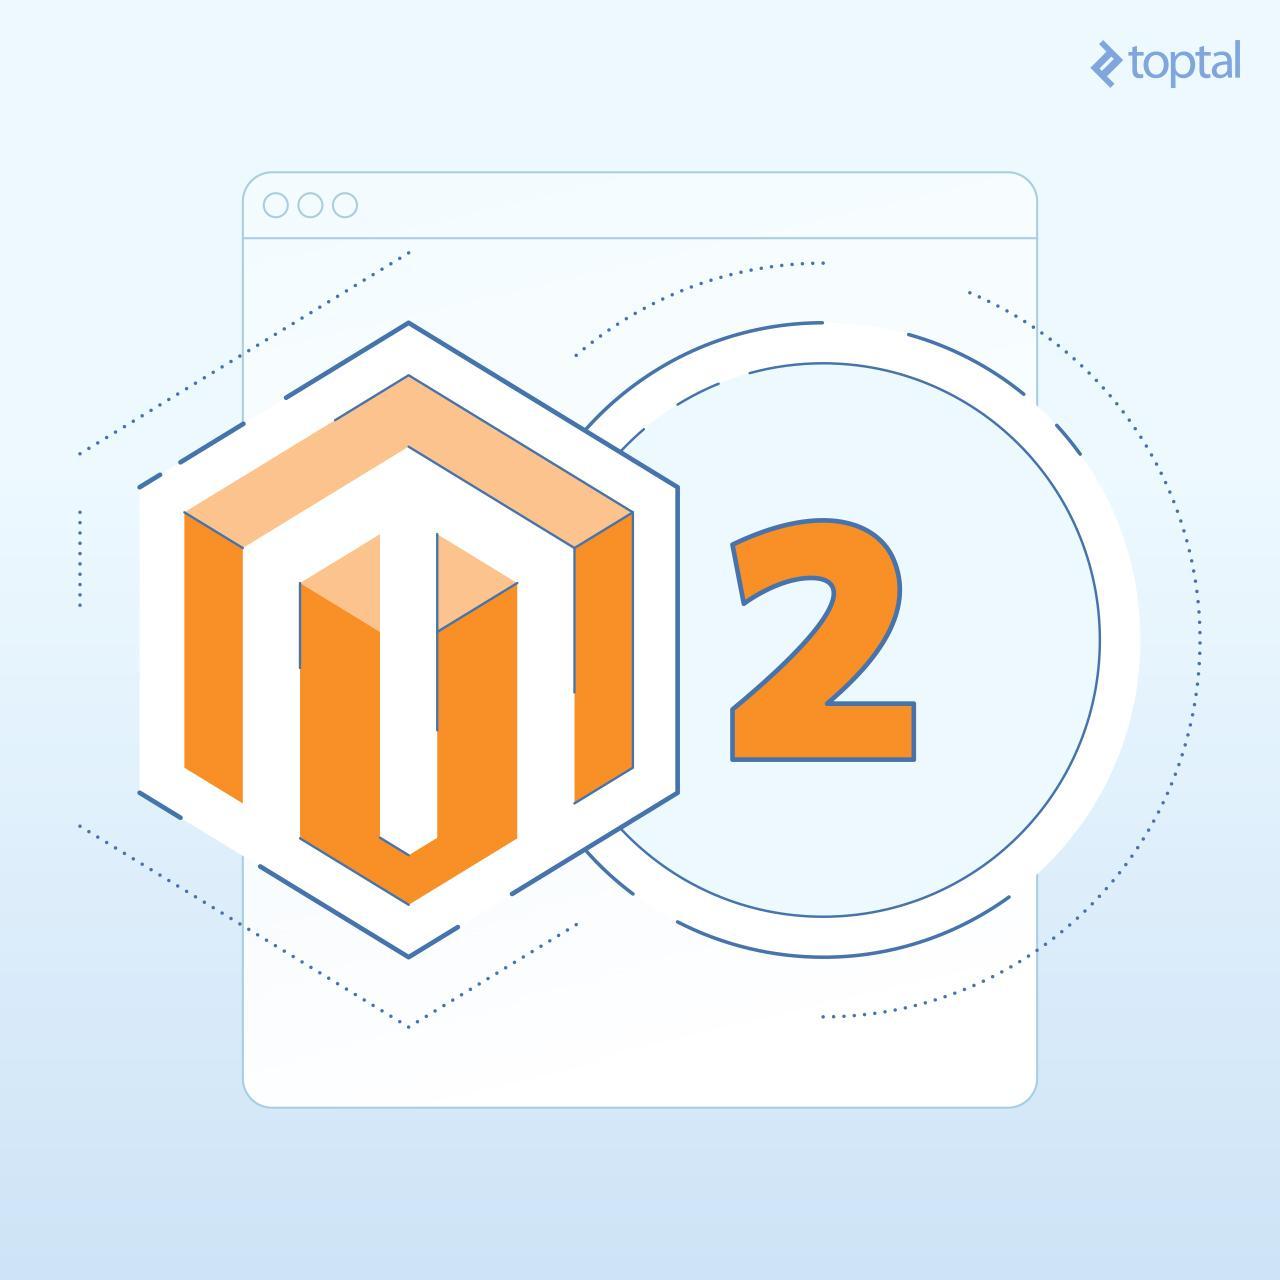 A stylized Magento 2 logo